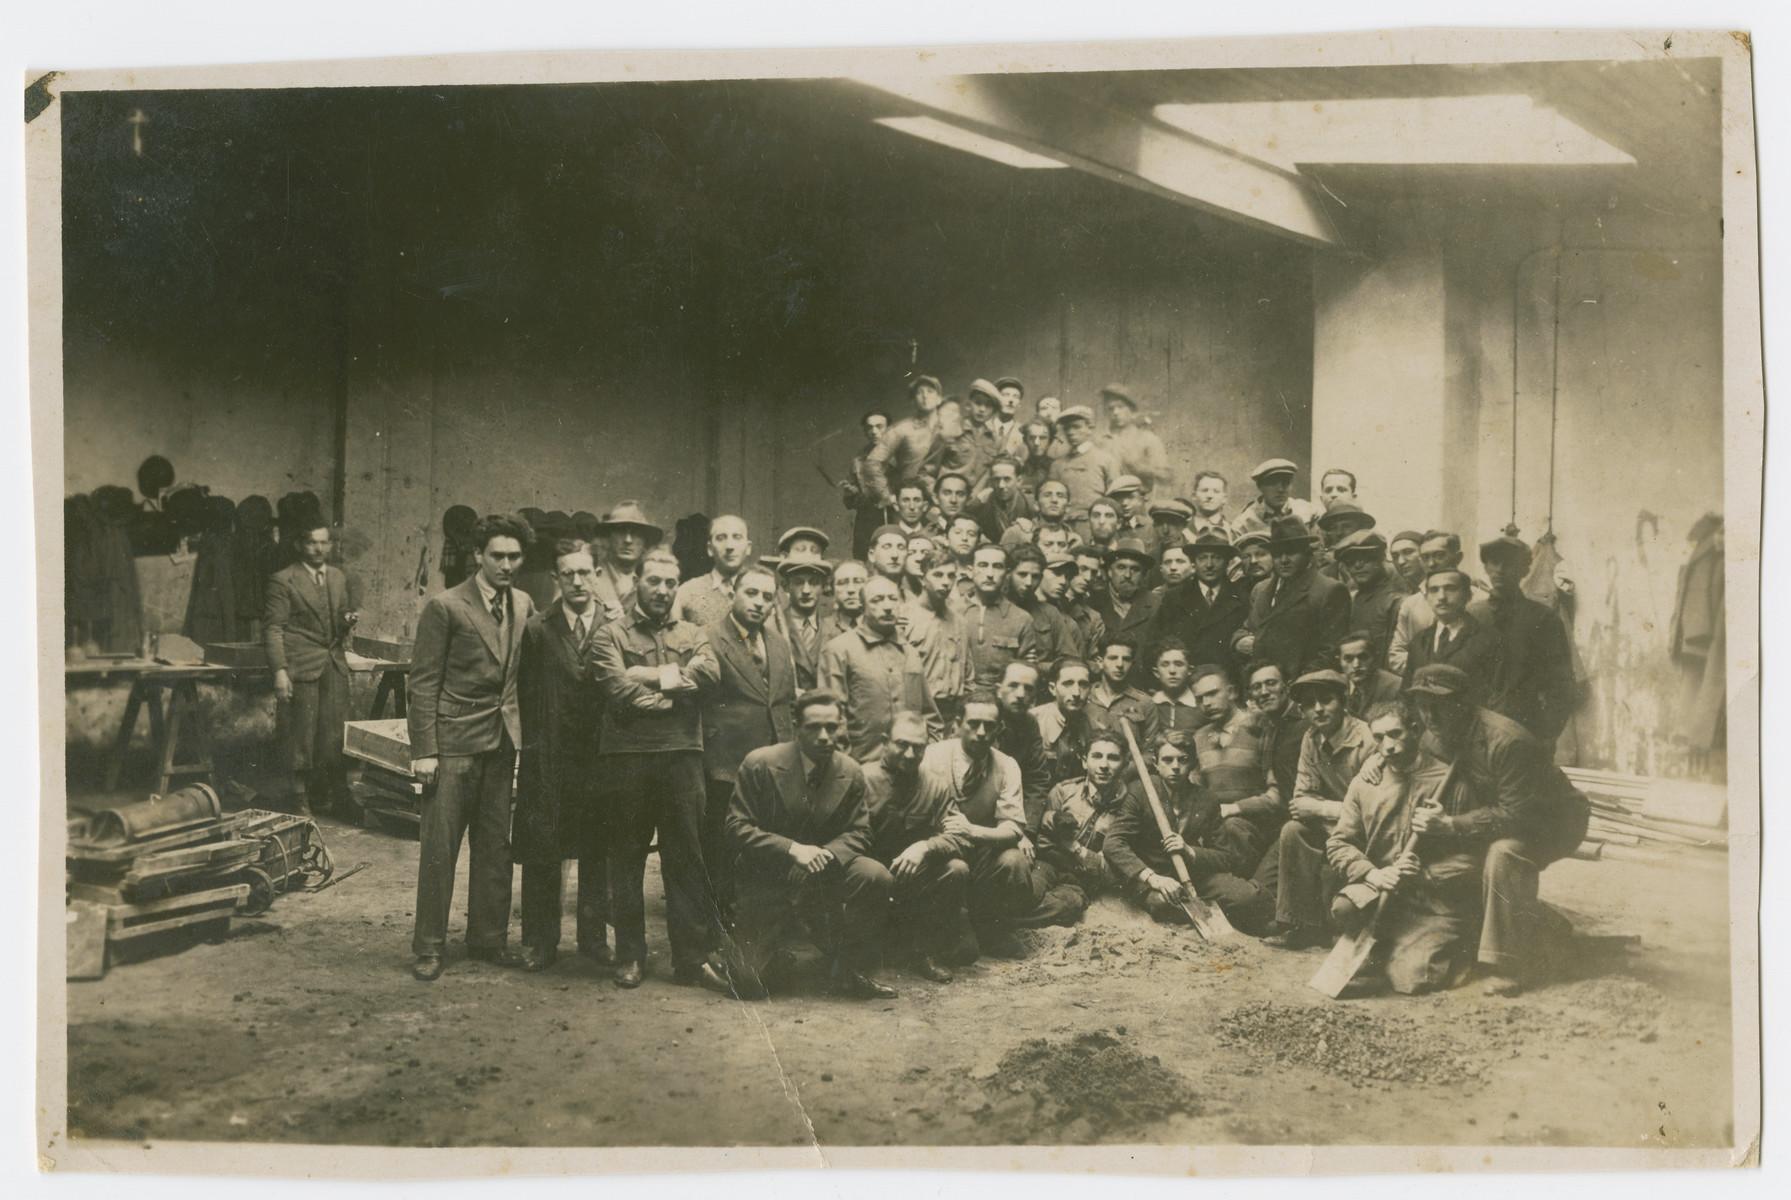 Group portrait of members of a kibbutz hachshara in prewar Poland.